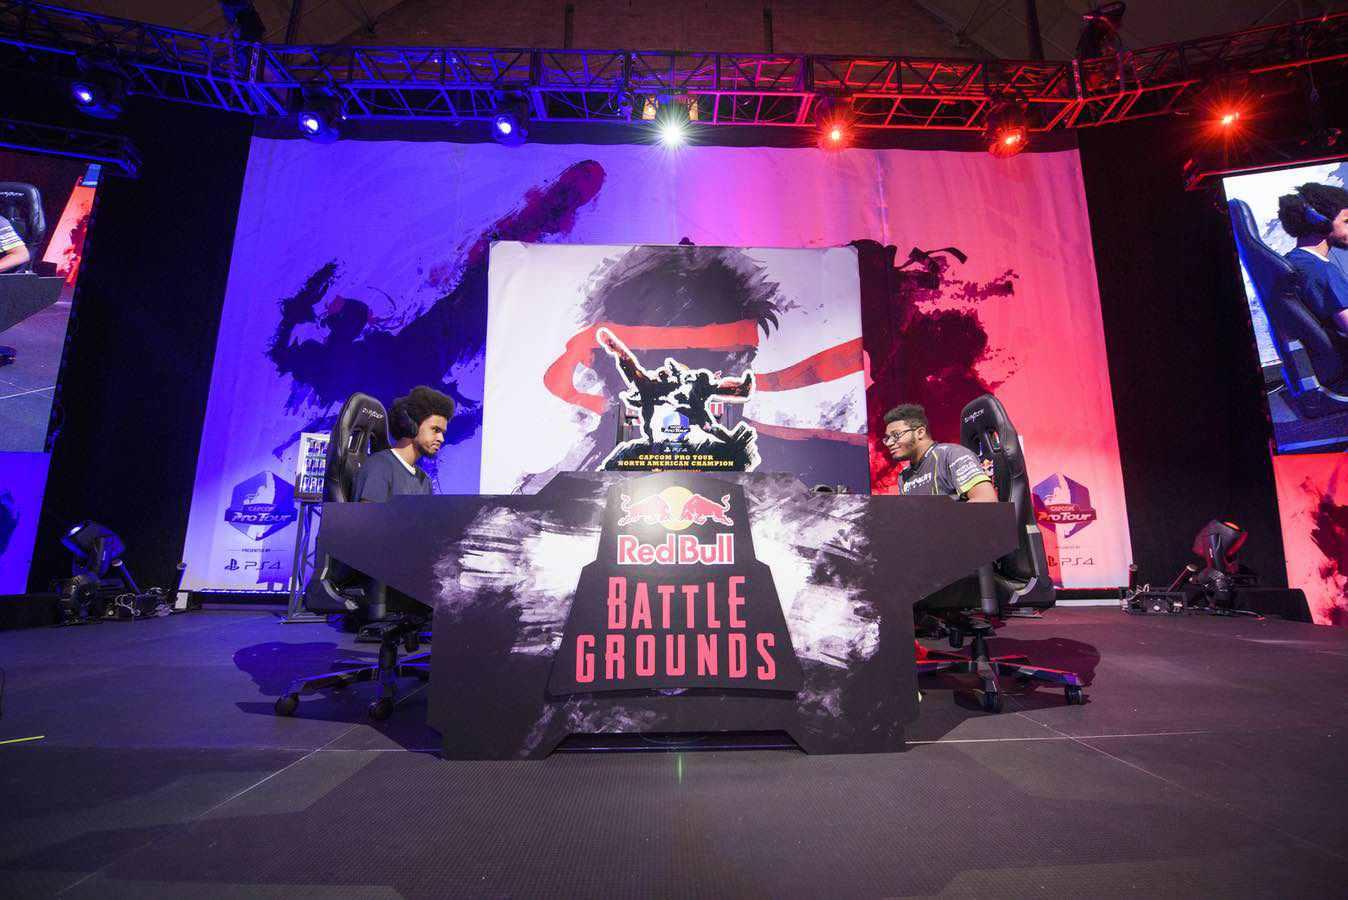 red bull battlegrounds boston